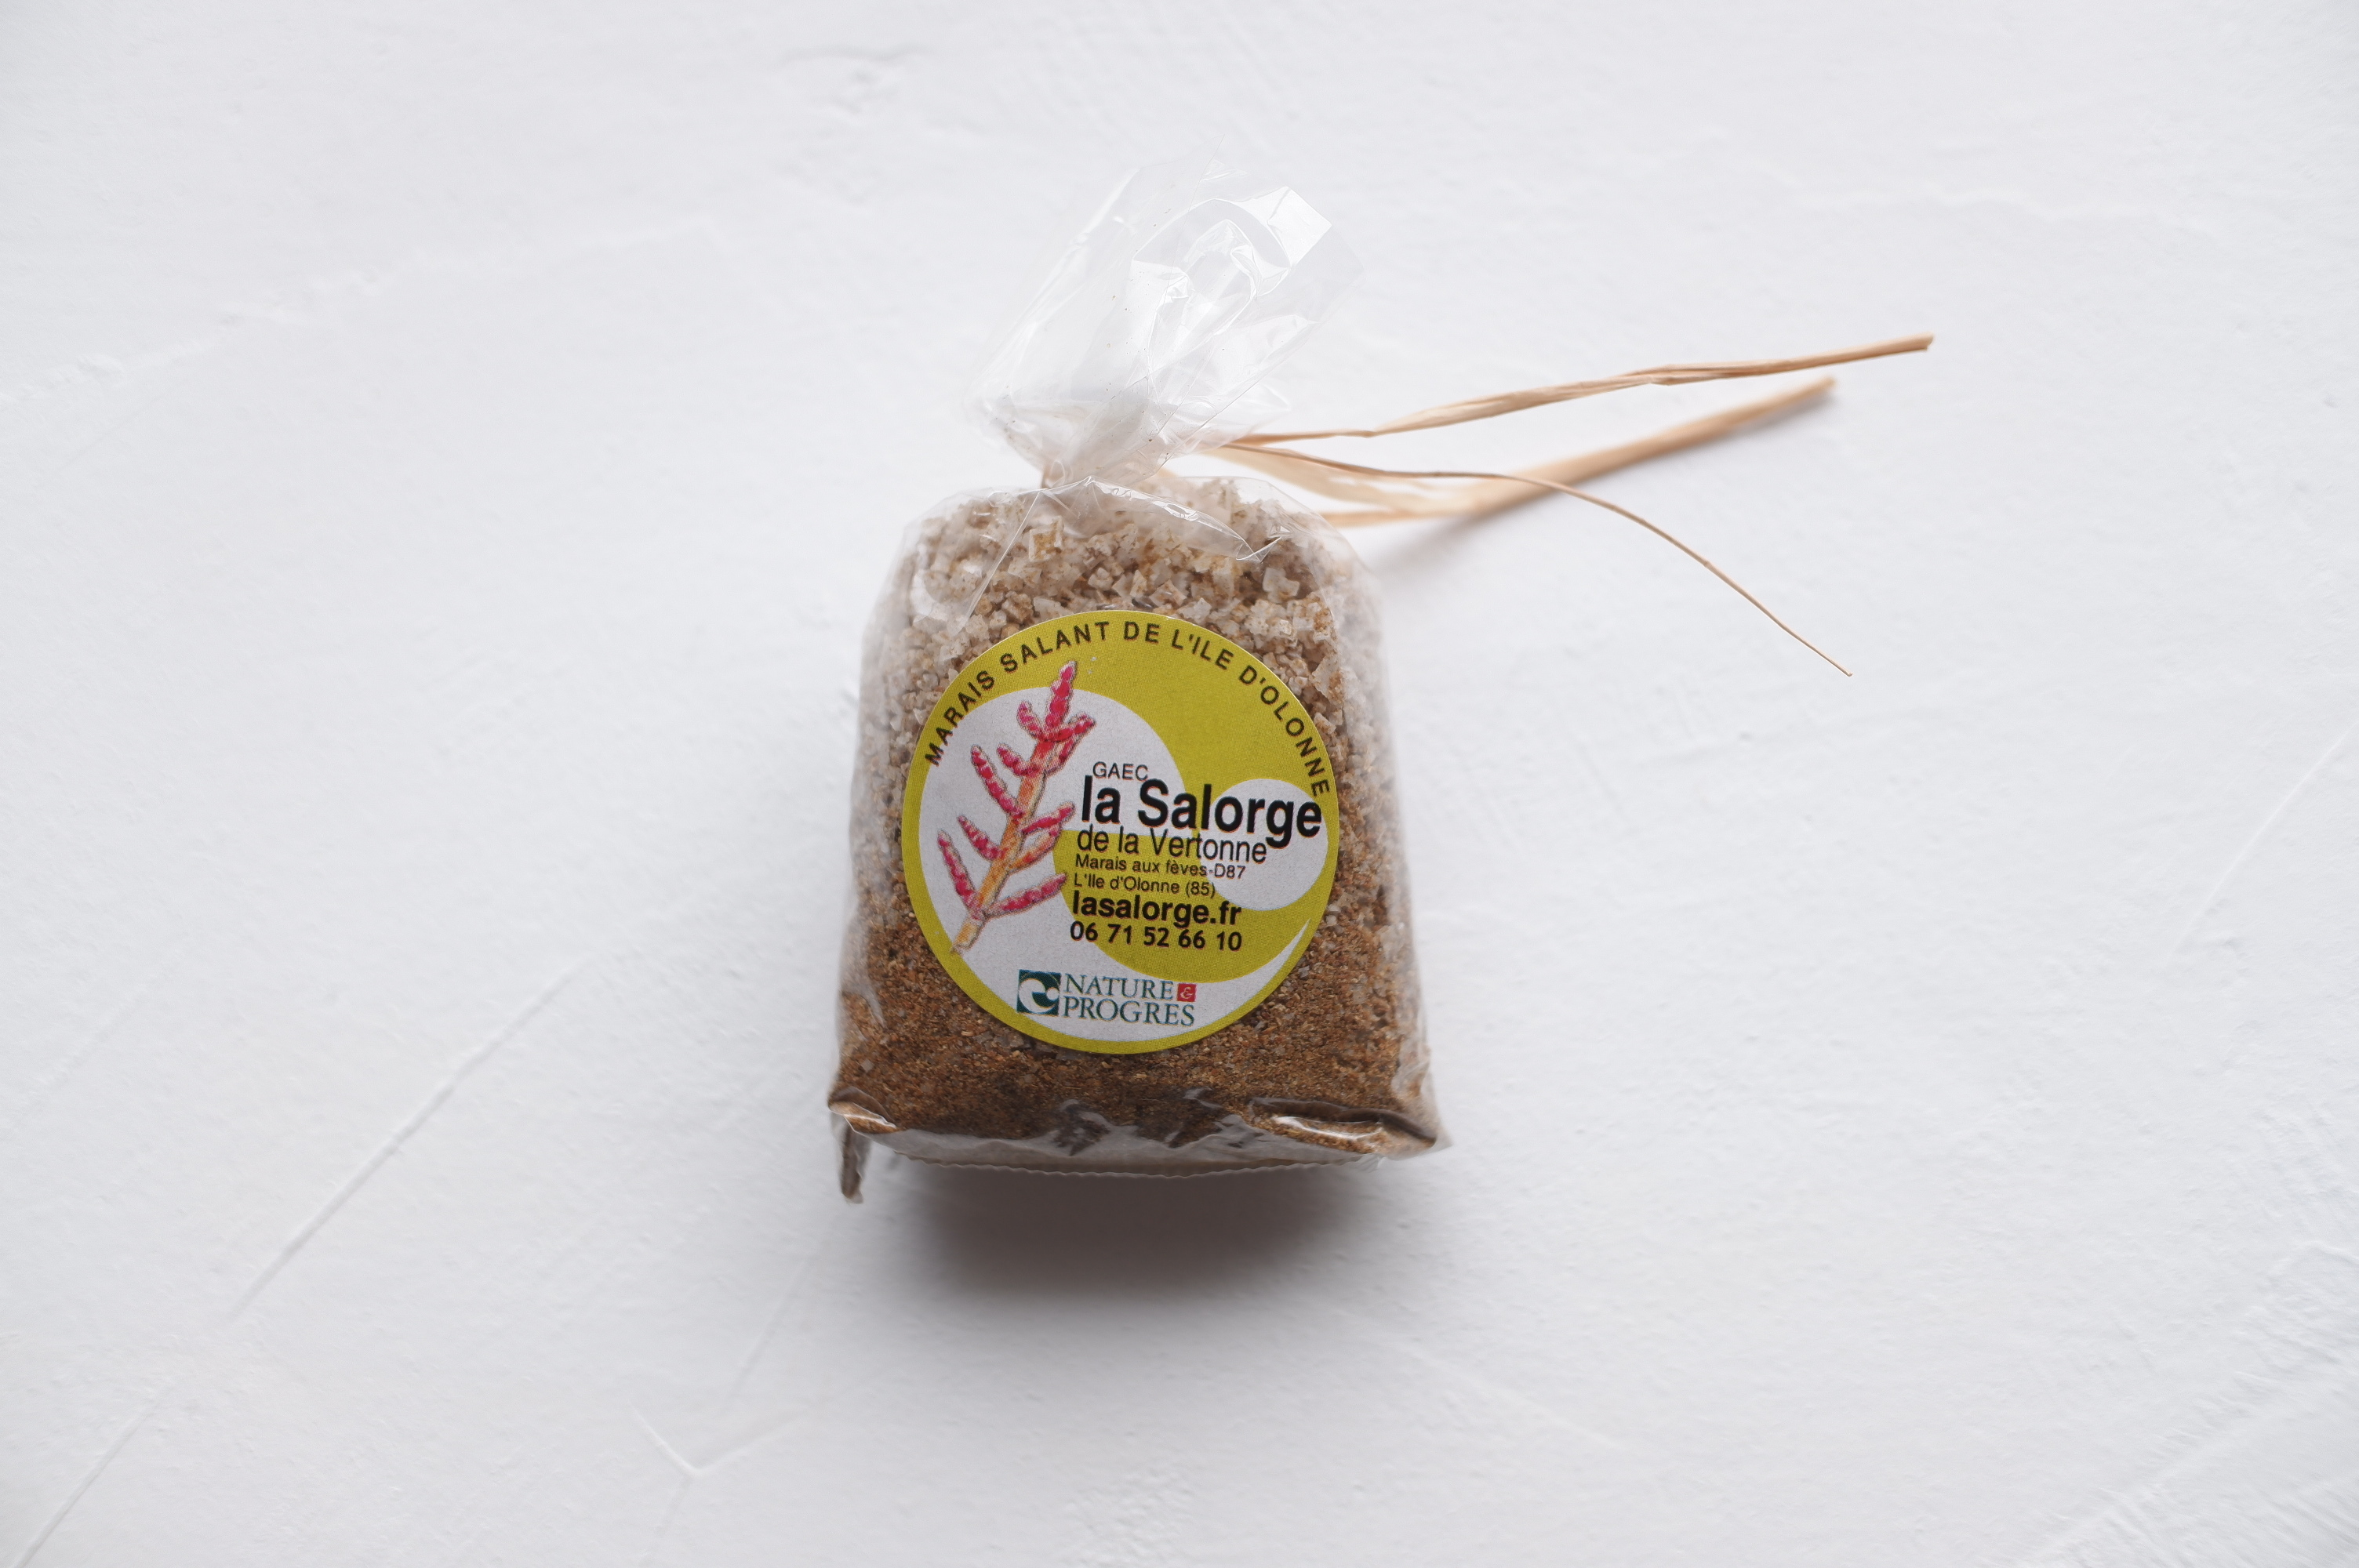 La Salorge de la Vertonne スパイス入り海塩( 粗塩 ) カレー 60g